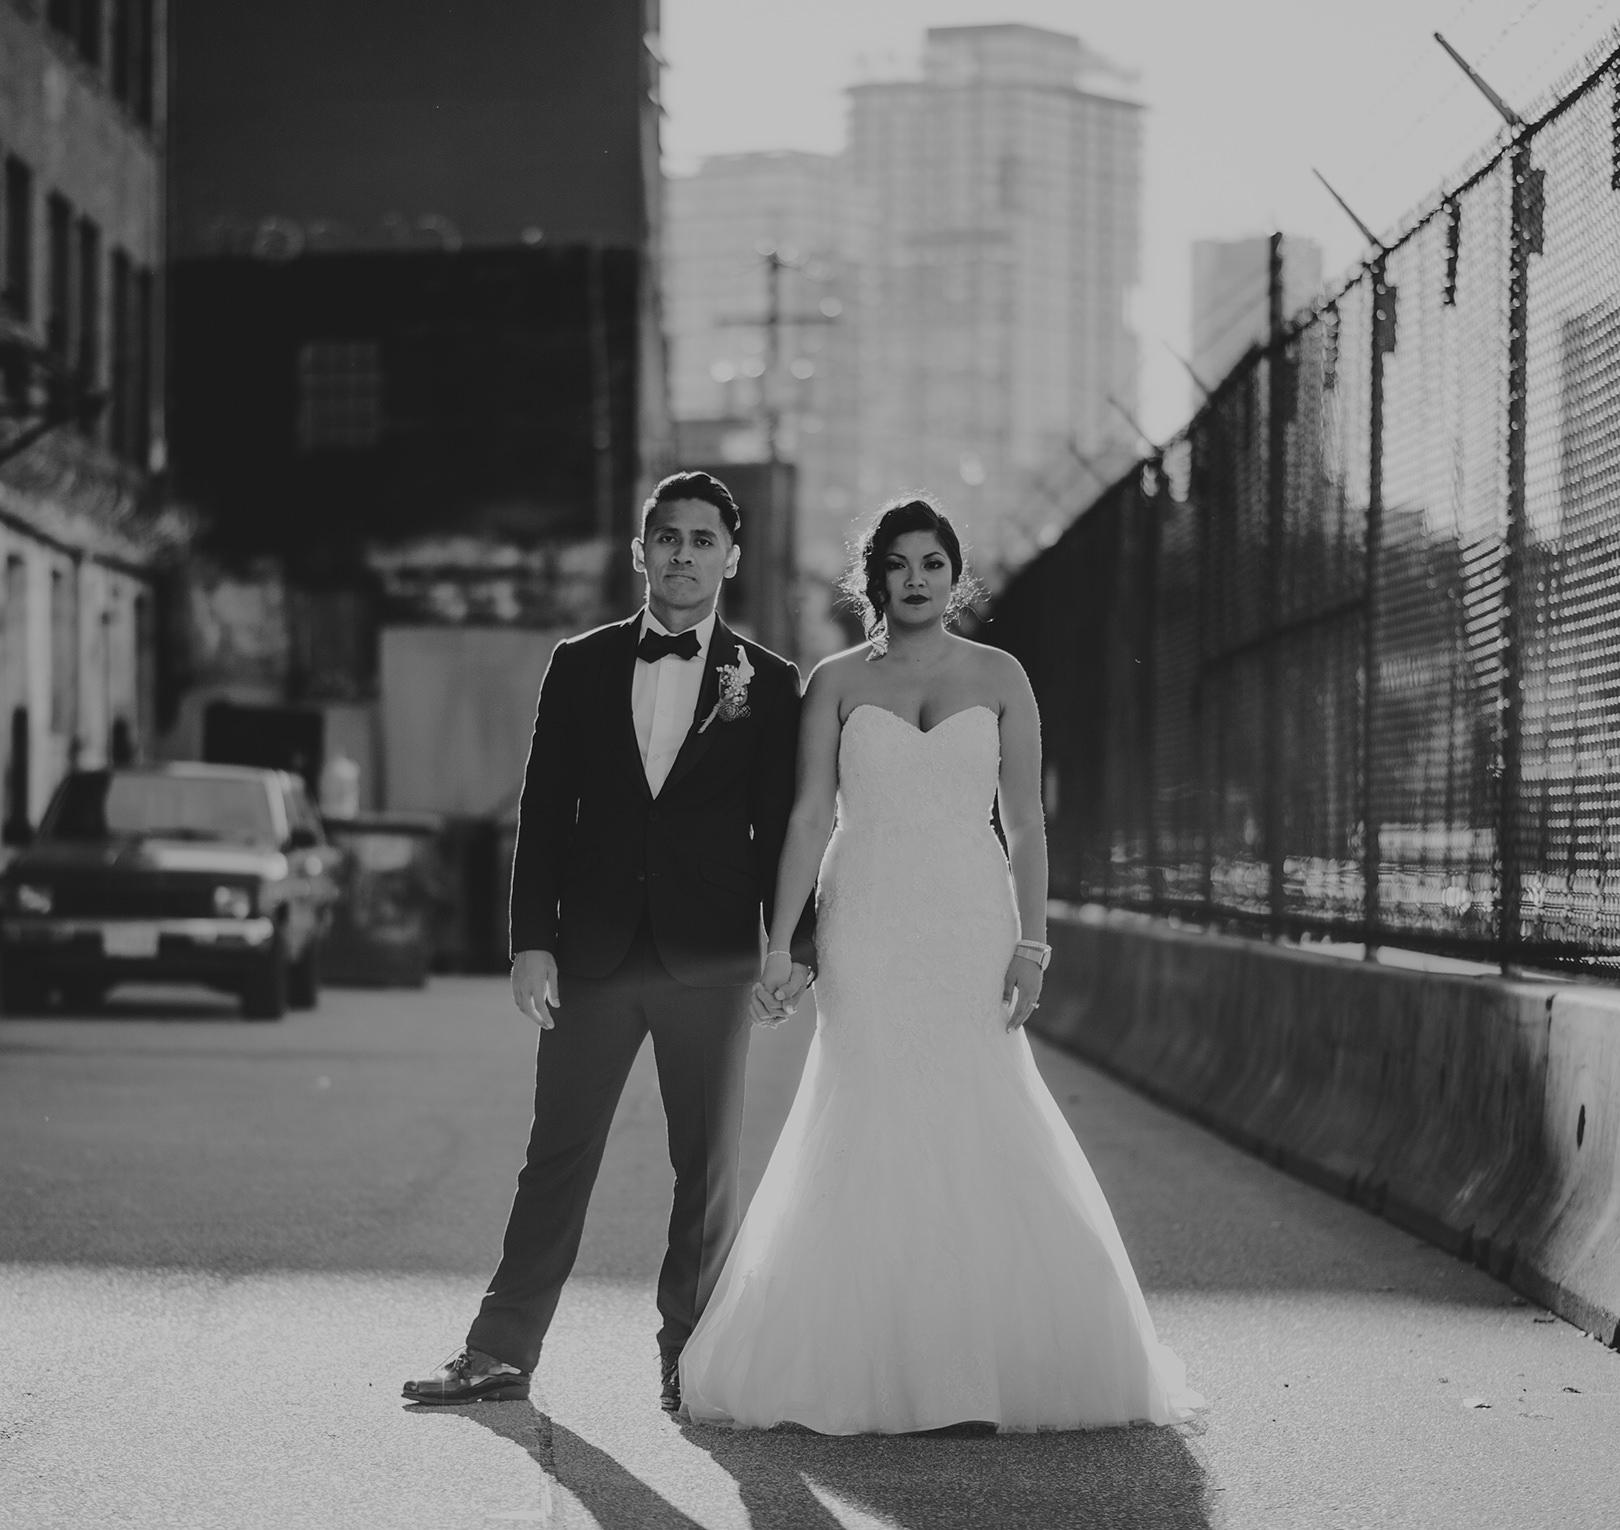 Spain Wedding Photographer - © Dallas Kolotylo Photography - 042